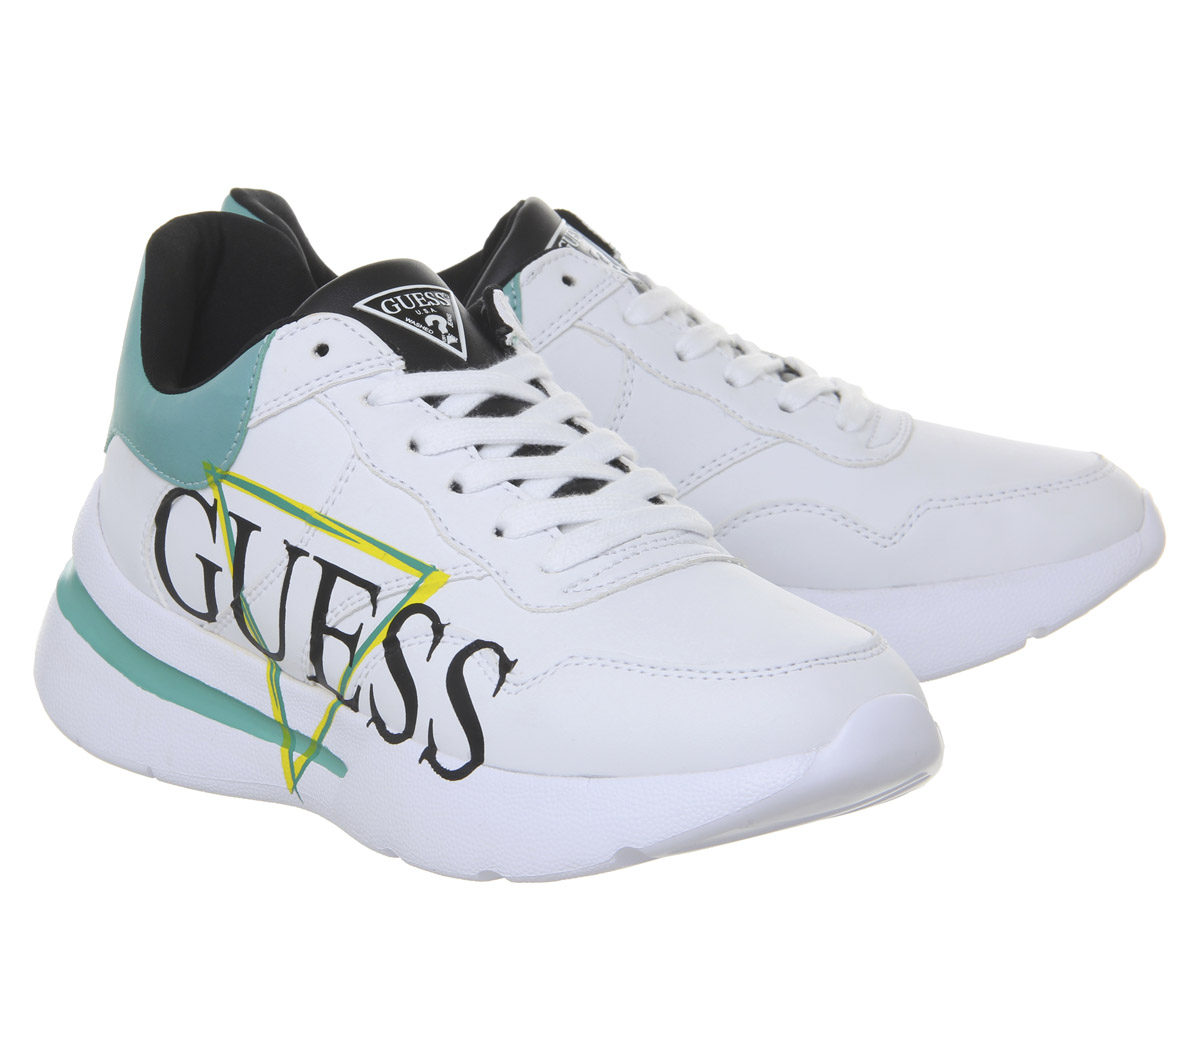 Womens Guess Milez Milez Milez Logo Sneakers White Grey bluee Multi Flats 7c7ce2